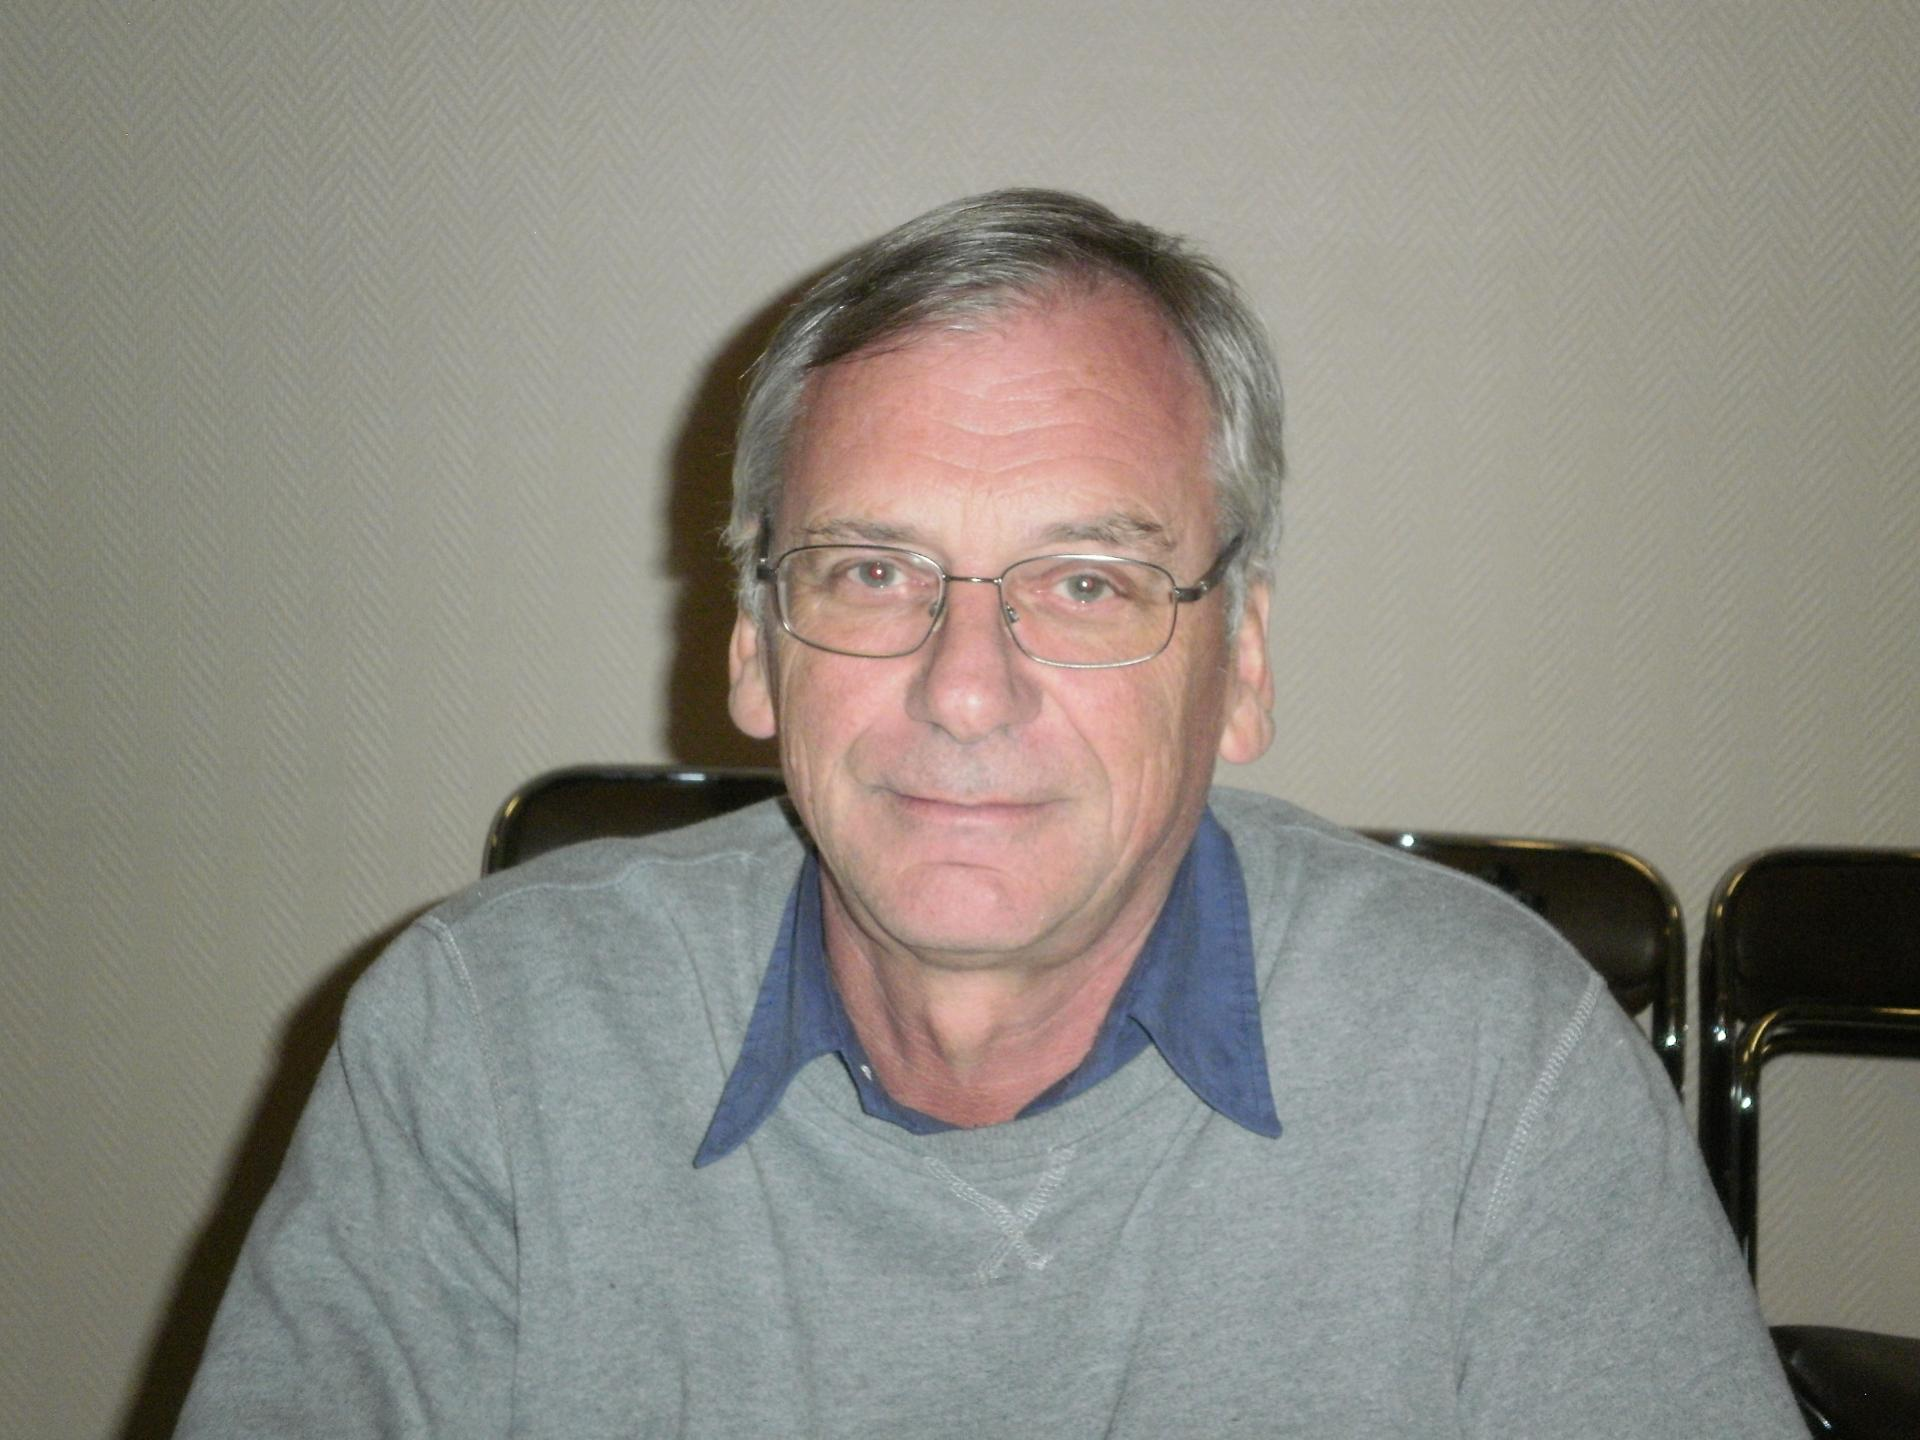 Michel durantin